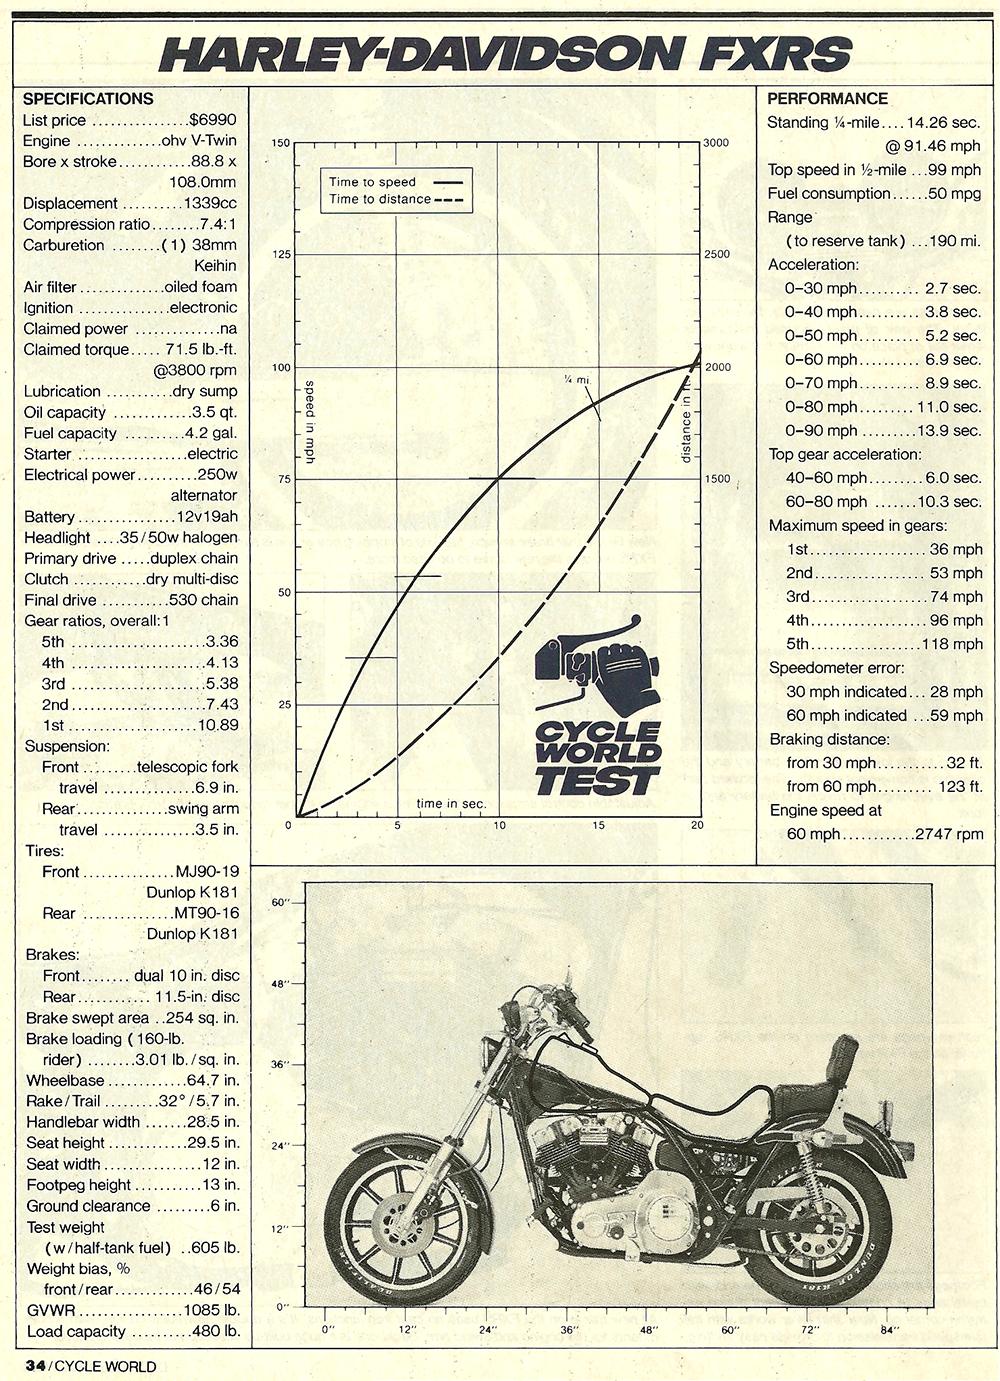 1981 Harley-Davidson FXRS road test 7.jpg